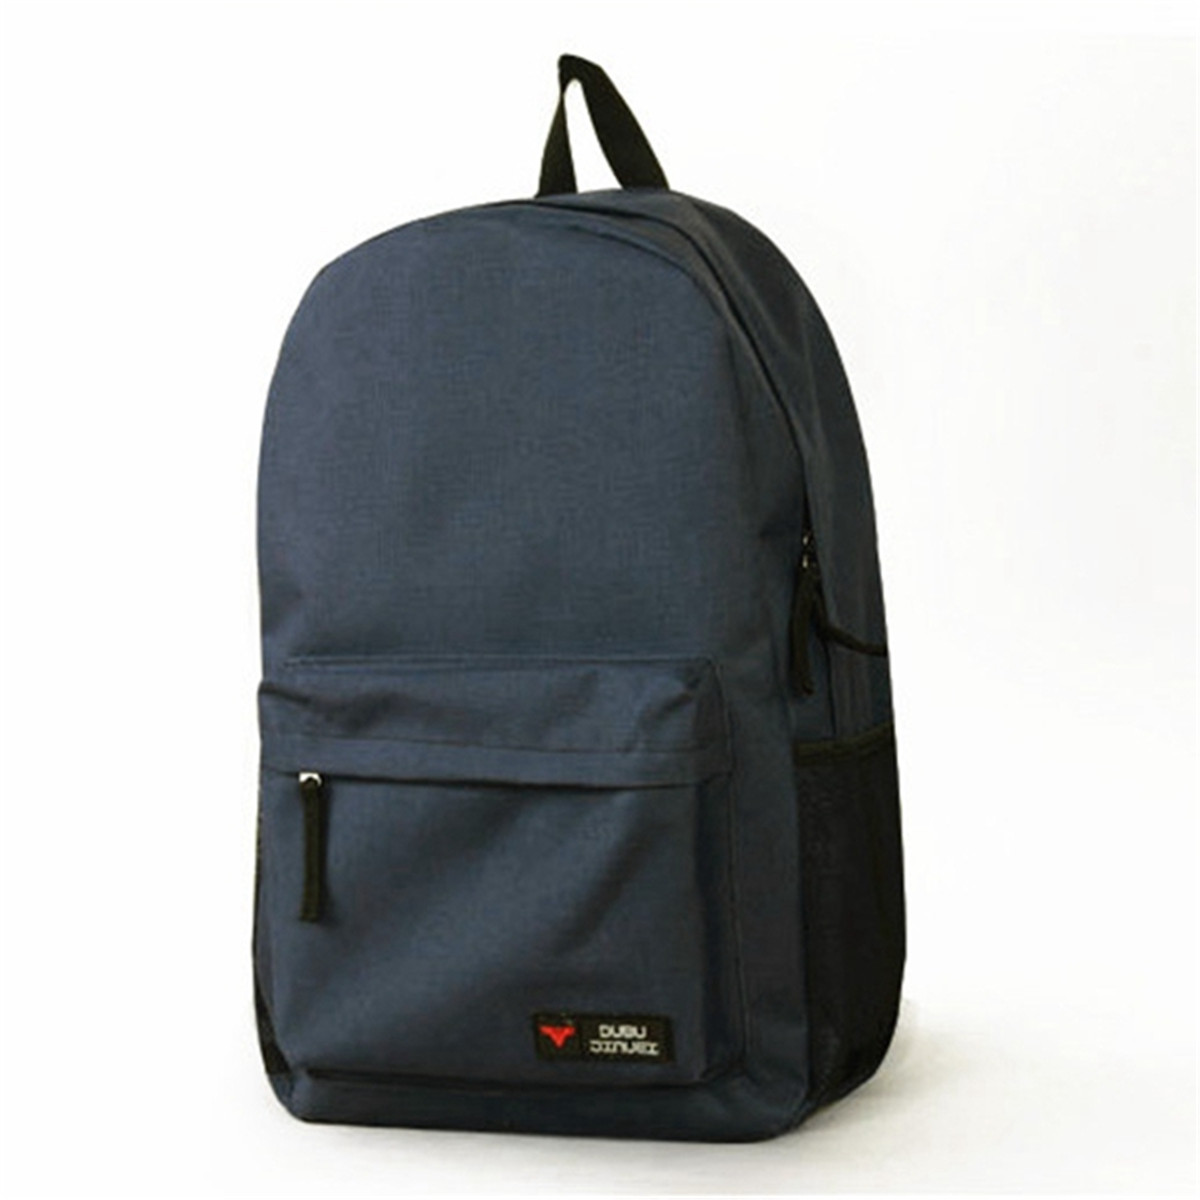 Women Men Oxford Cloth Backpack Travel School Shoulder Bag Plain Rucksack Canvas